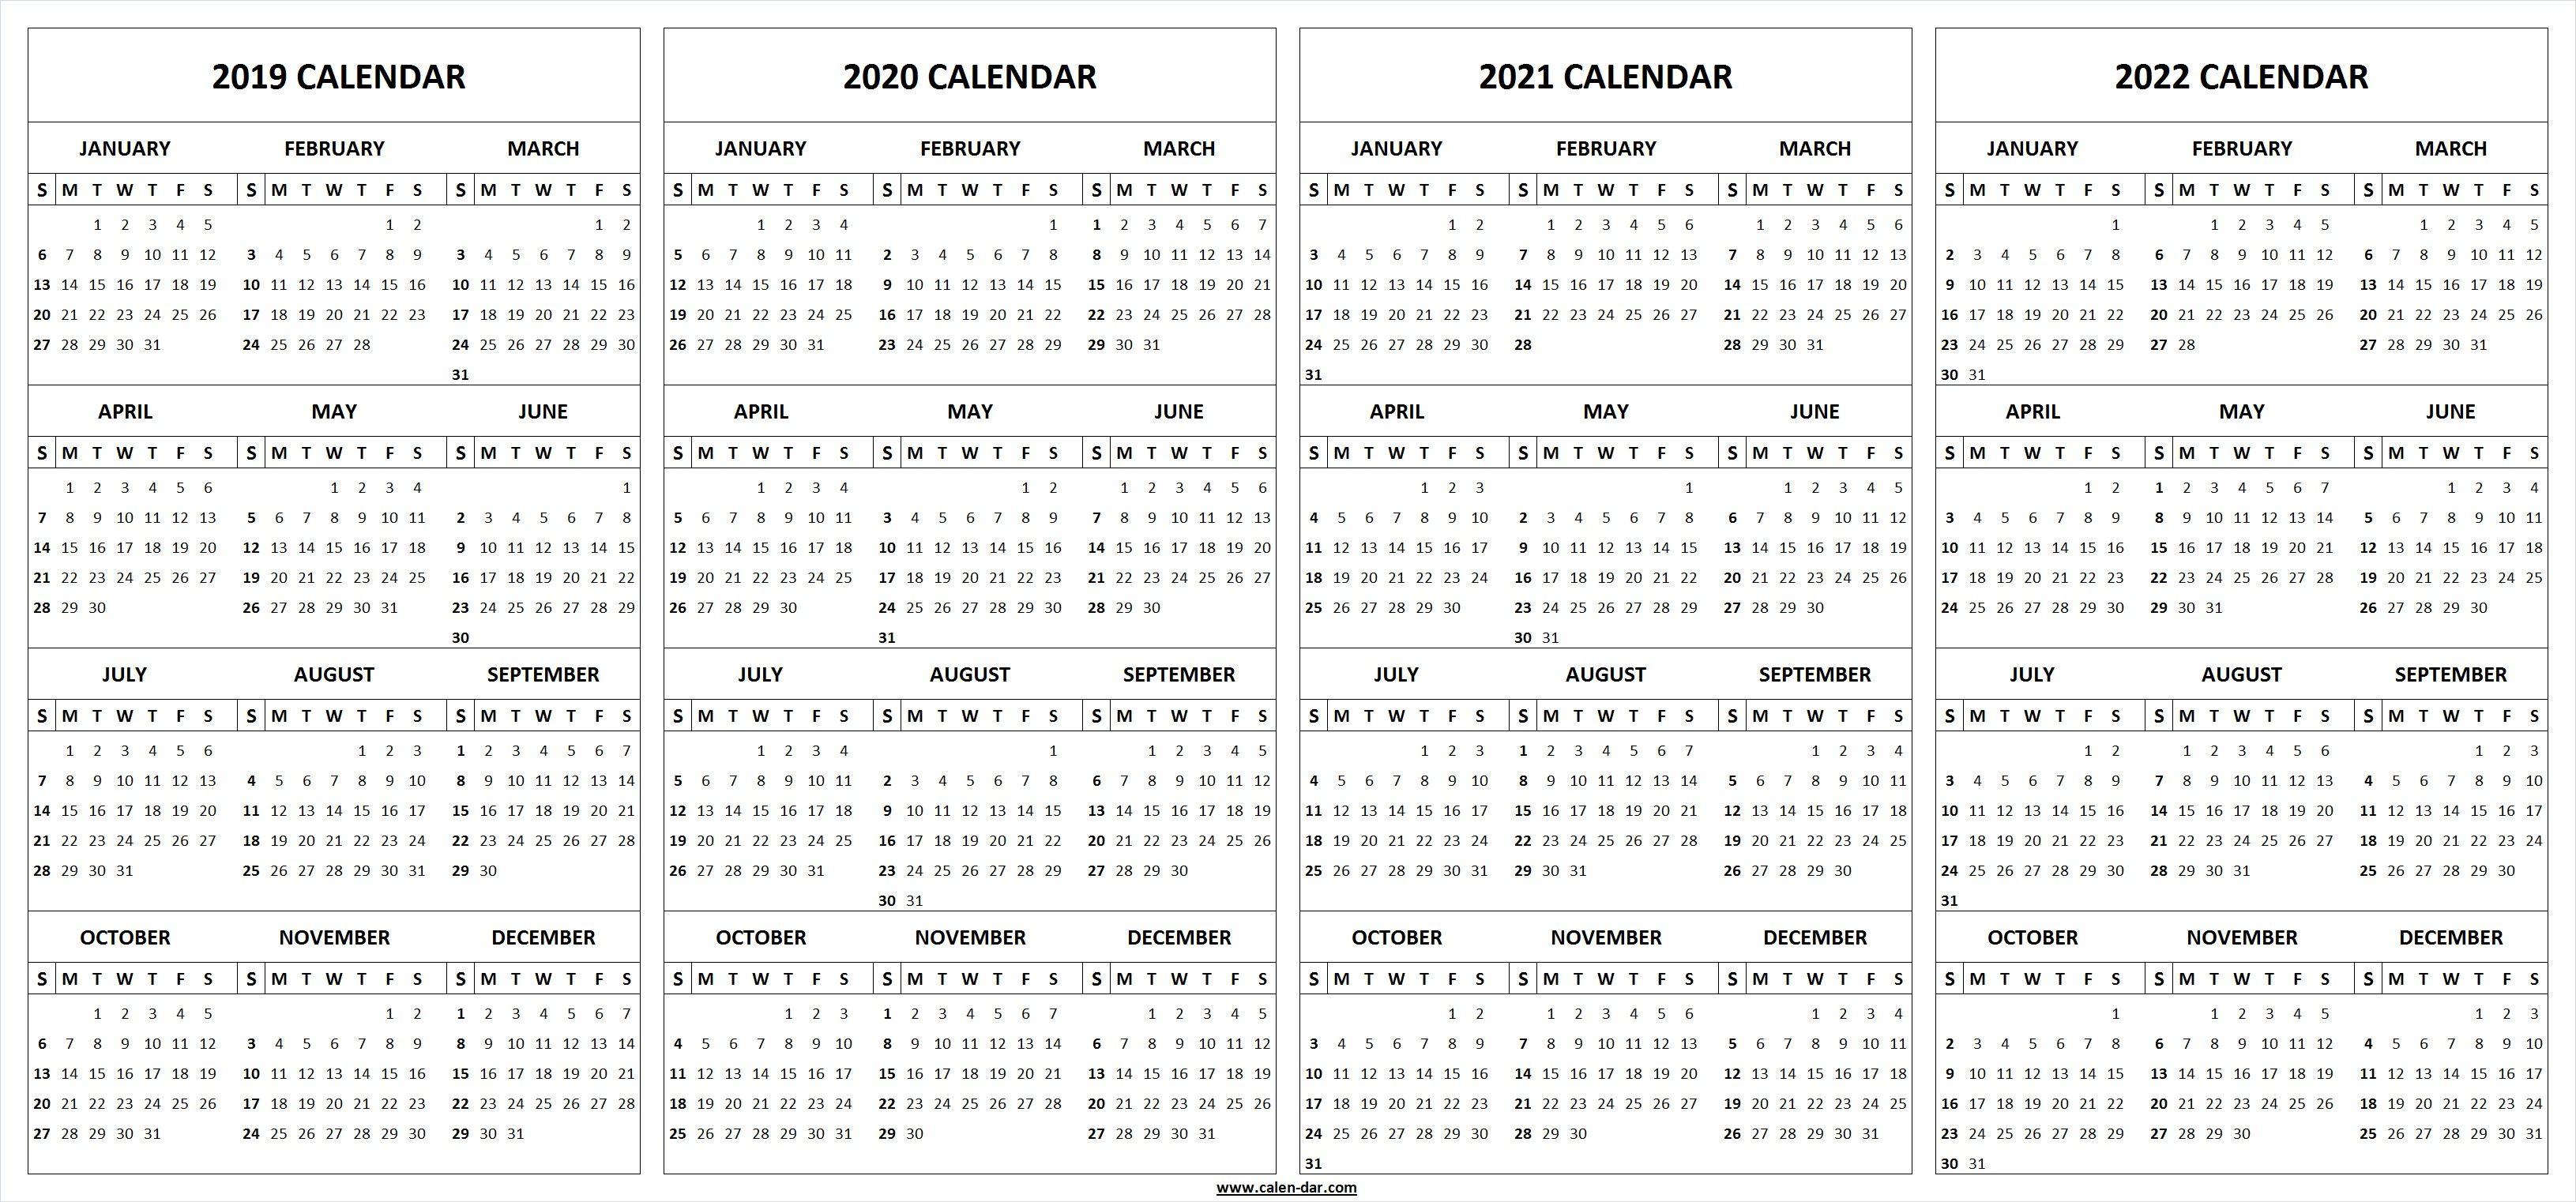 2019 2020 2021 2022 Calendar Blank Template | Calendar | 2021 with 2019 2020 Ms Word Calendar